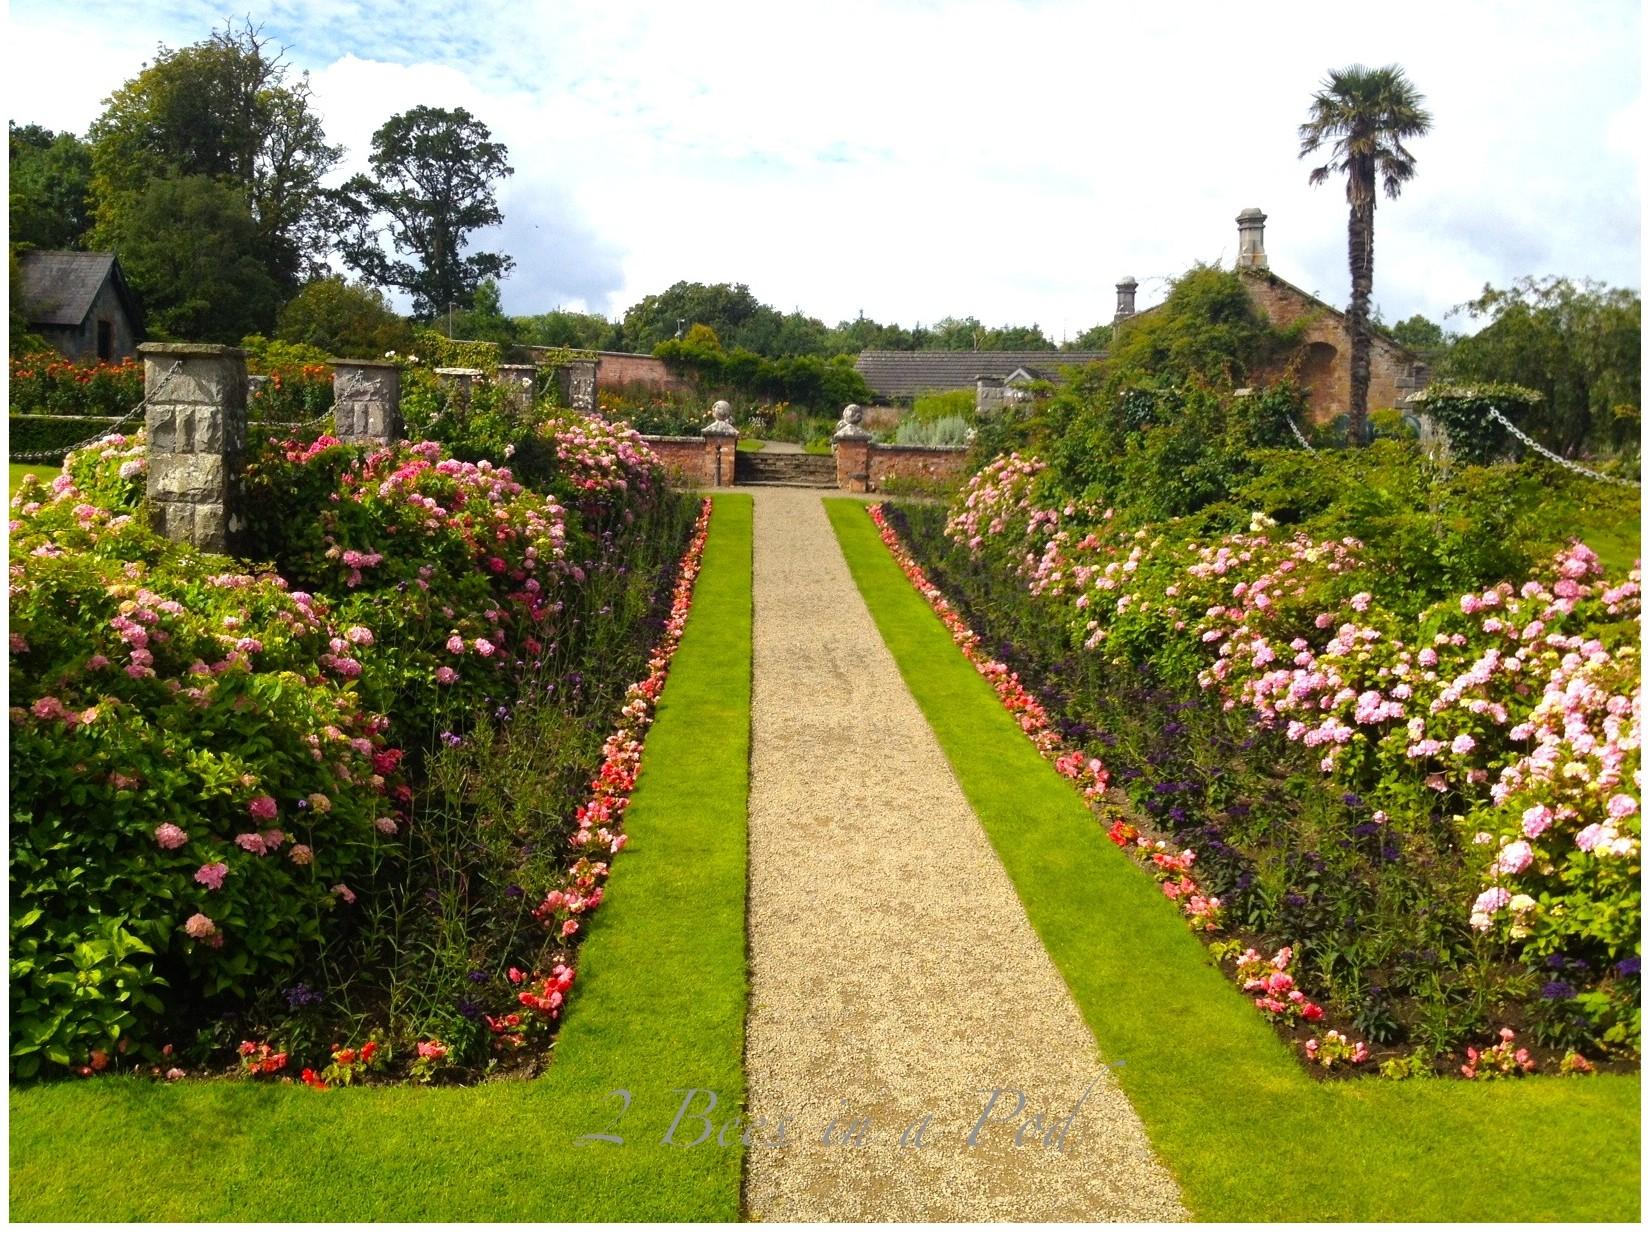 Dromoland Castle - Ireland. Beautiful gardens